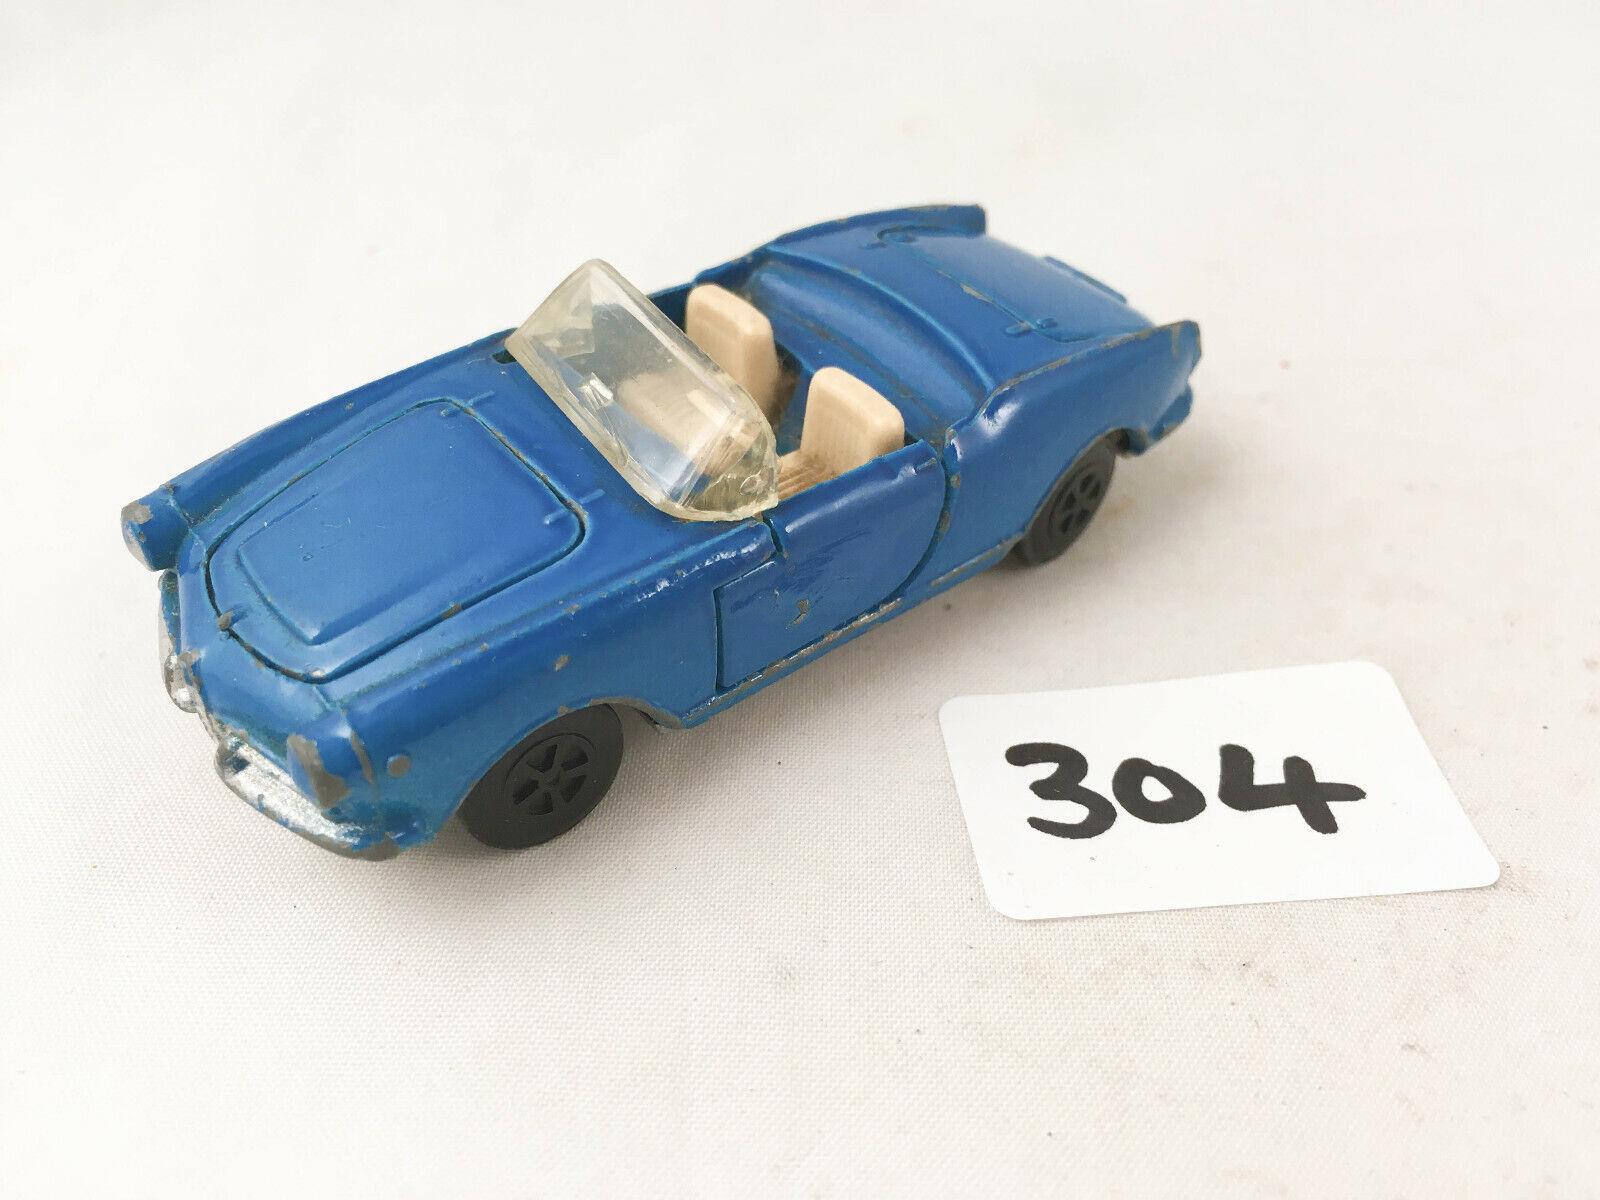 LONE STAR IMPY FliegenERS   23 ALFA ROMEO GIULIA 1600 SPIDER Blau DIECAST TOY CAR